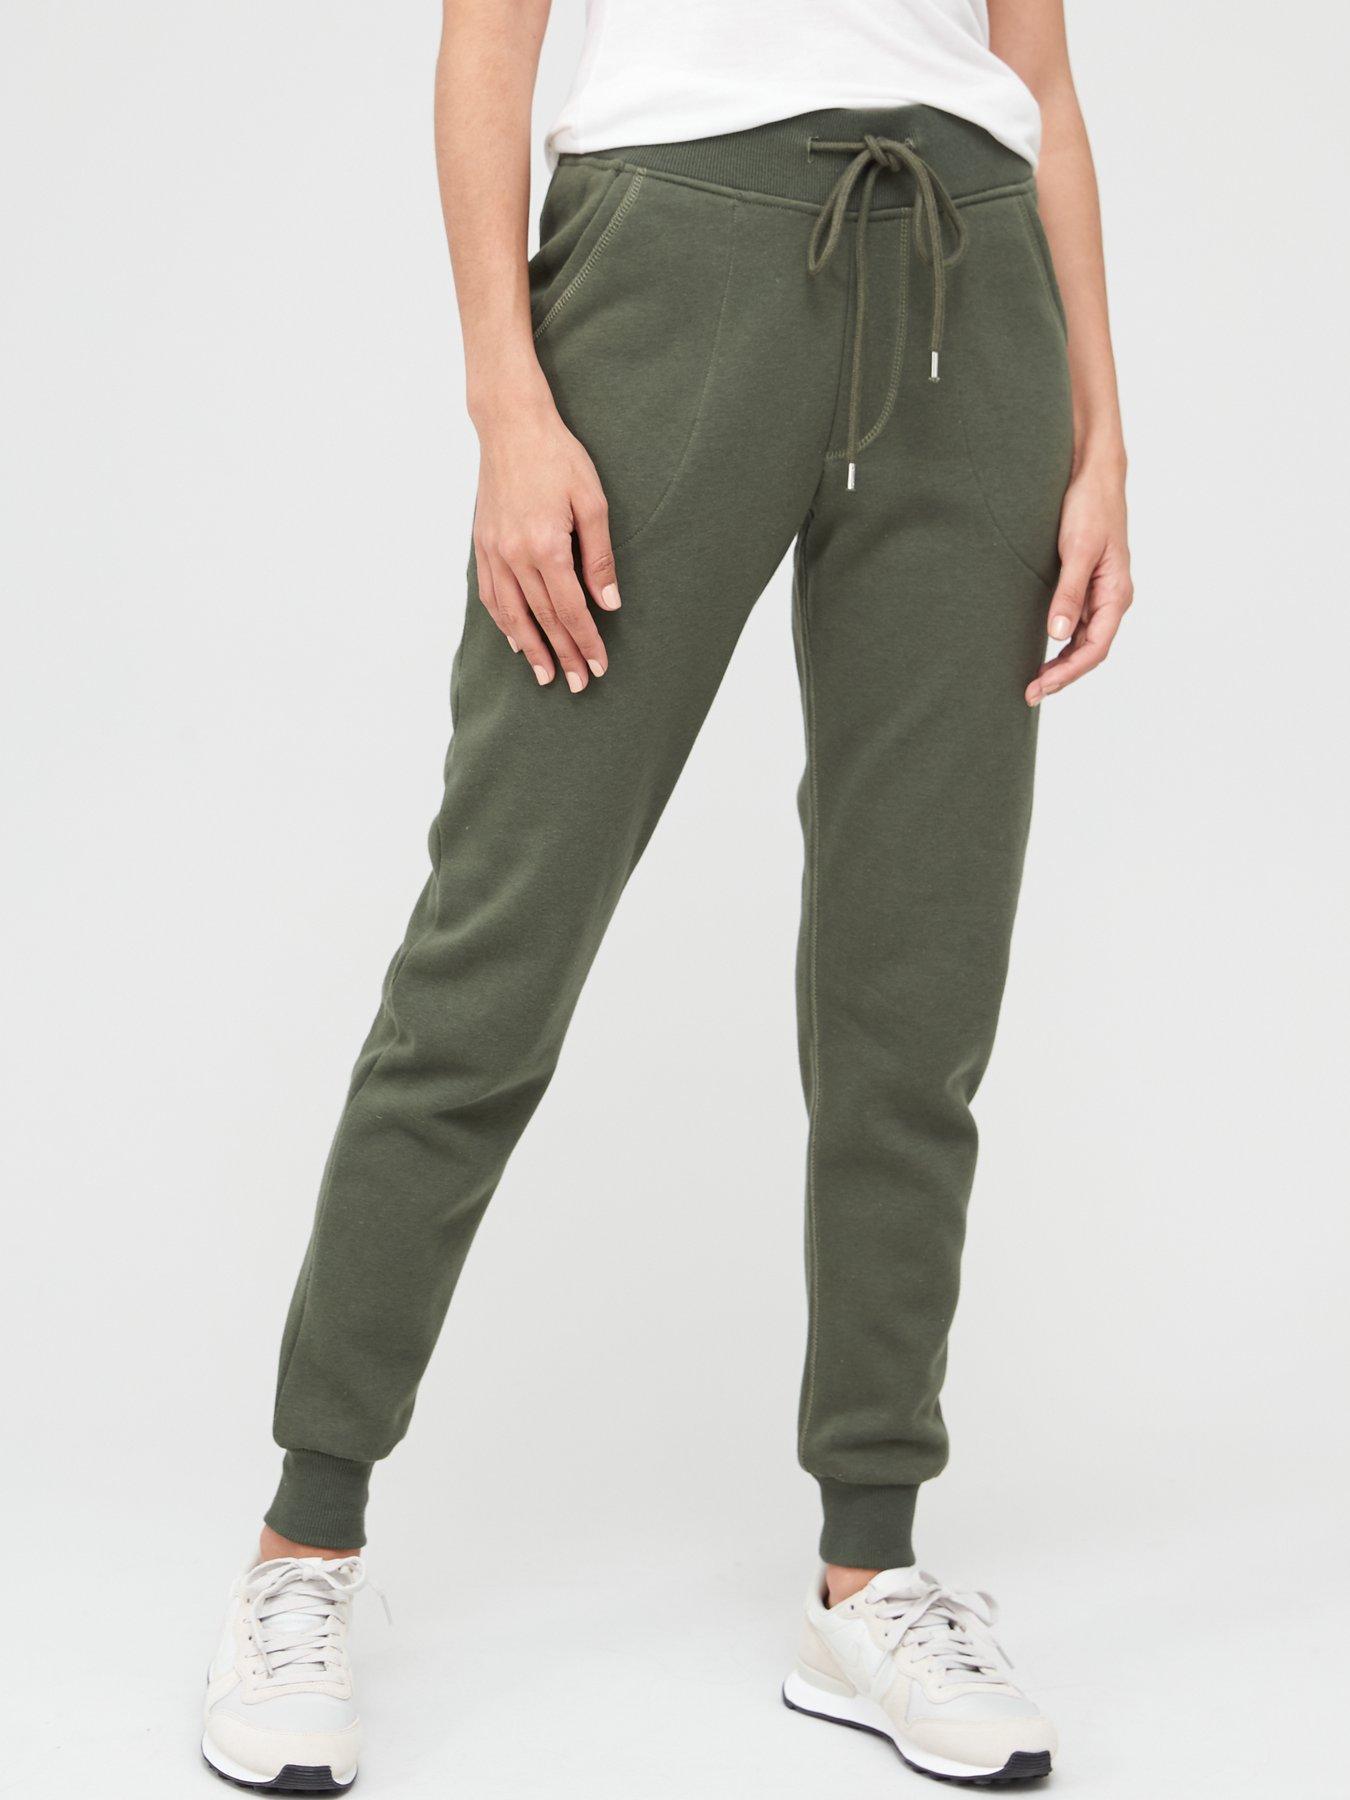 Extra Short Black Zip Super Skinny Girls School Trousers Super Skinny Stretch Hipster in Black//Grey 33 Inside Leg